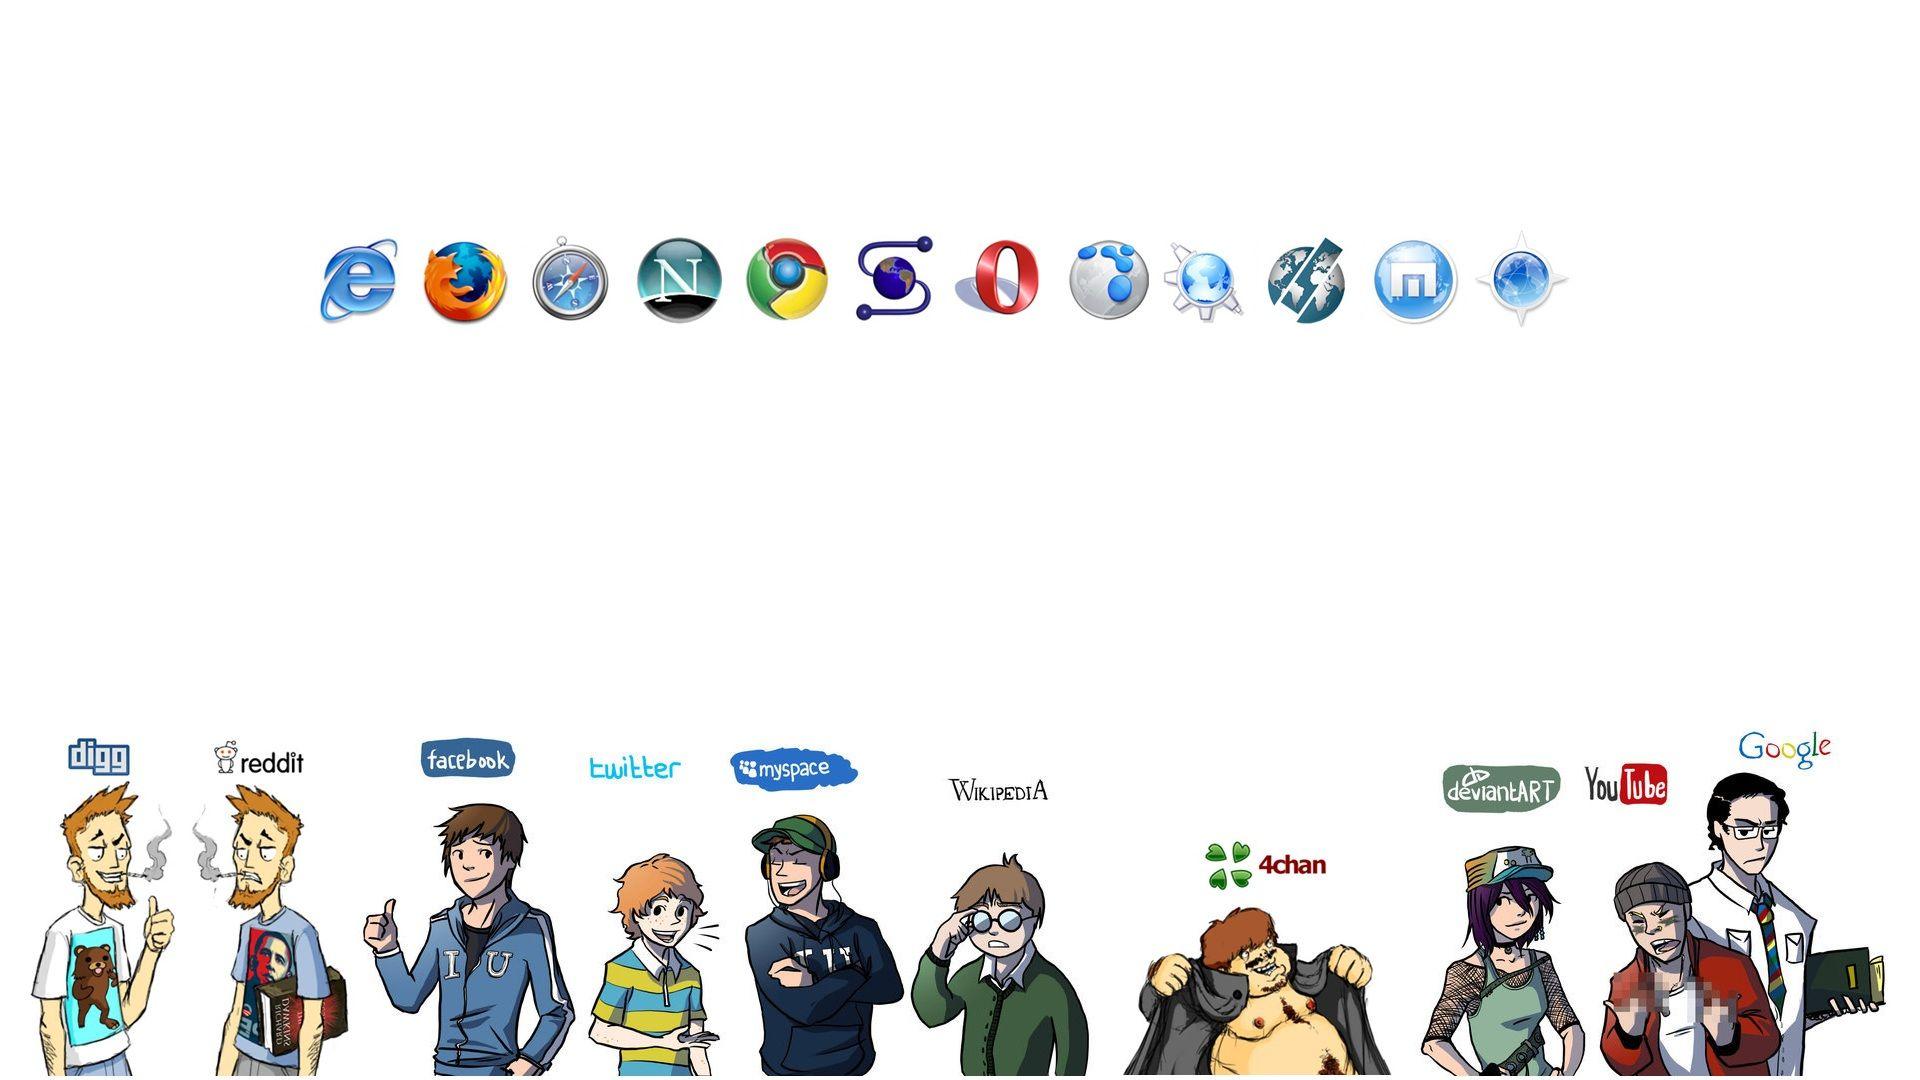 Facebook Opera web browser Firefox Google Youtube Twitter